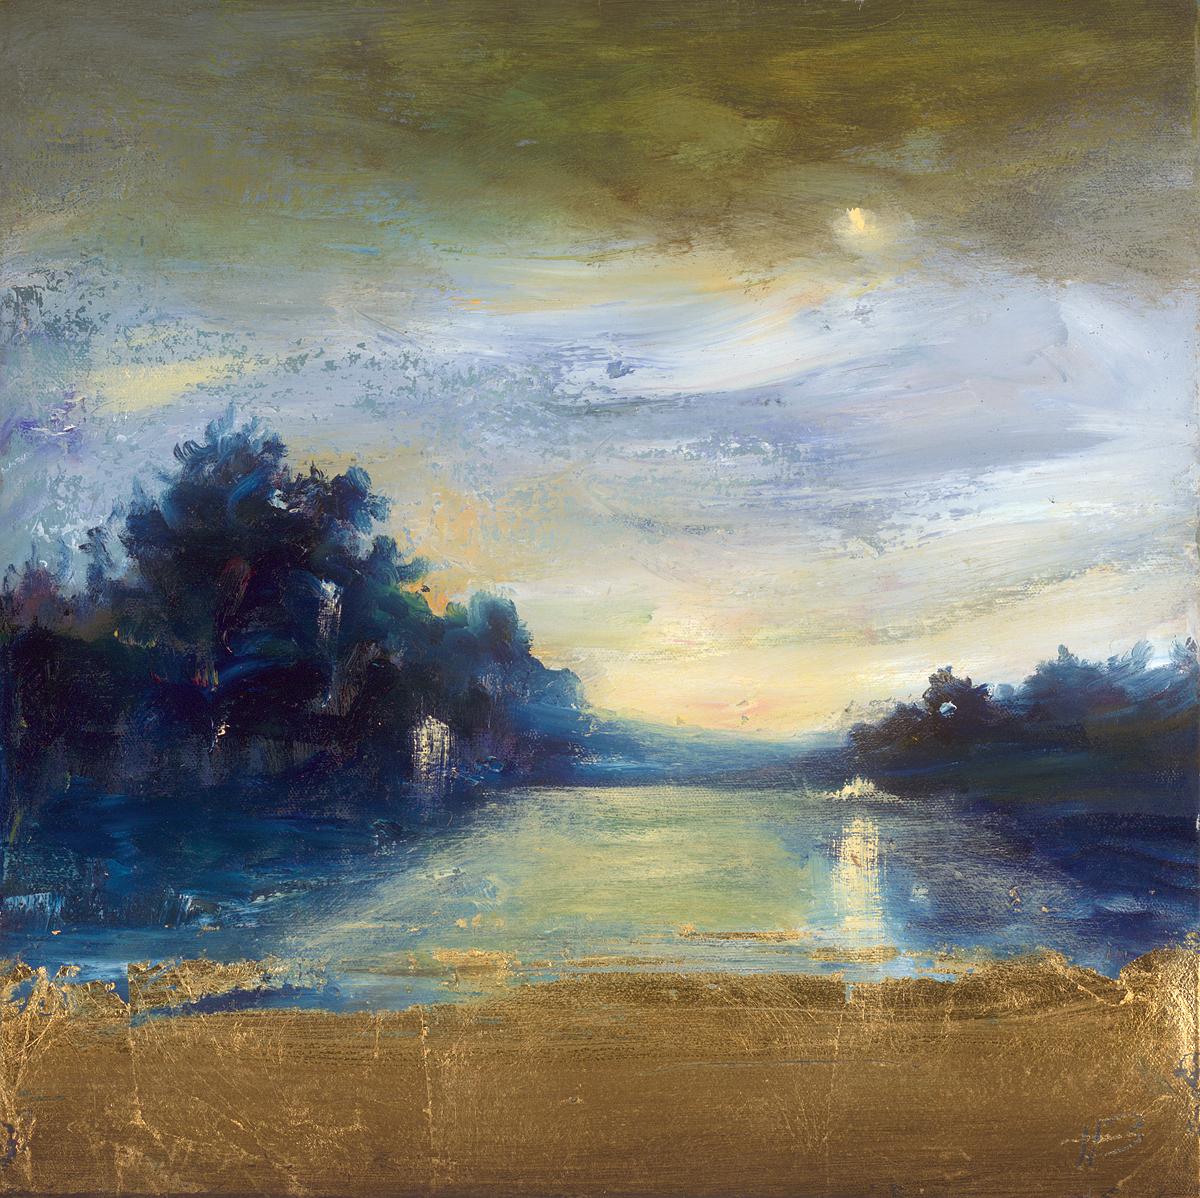 """Deep Blue Landscape"" (2008) by Holland Berkley, Park West Gallery."